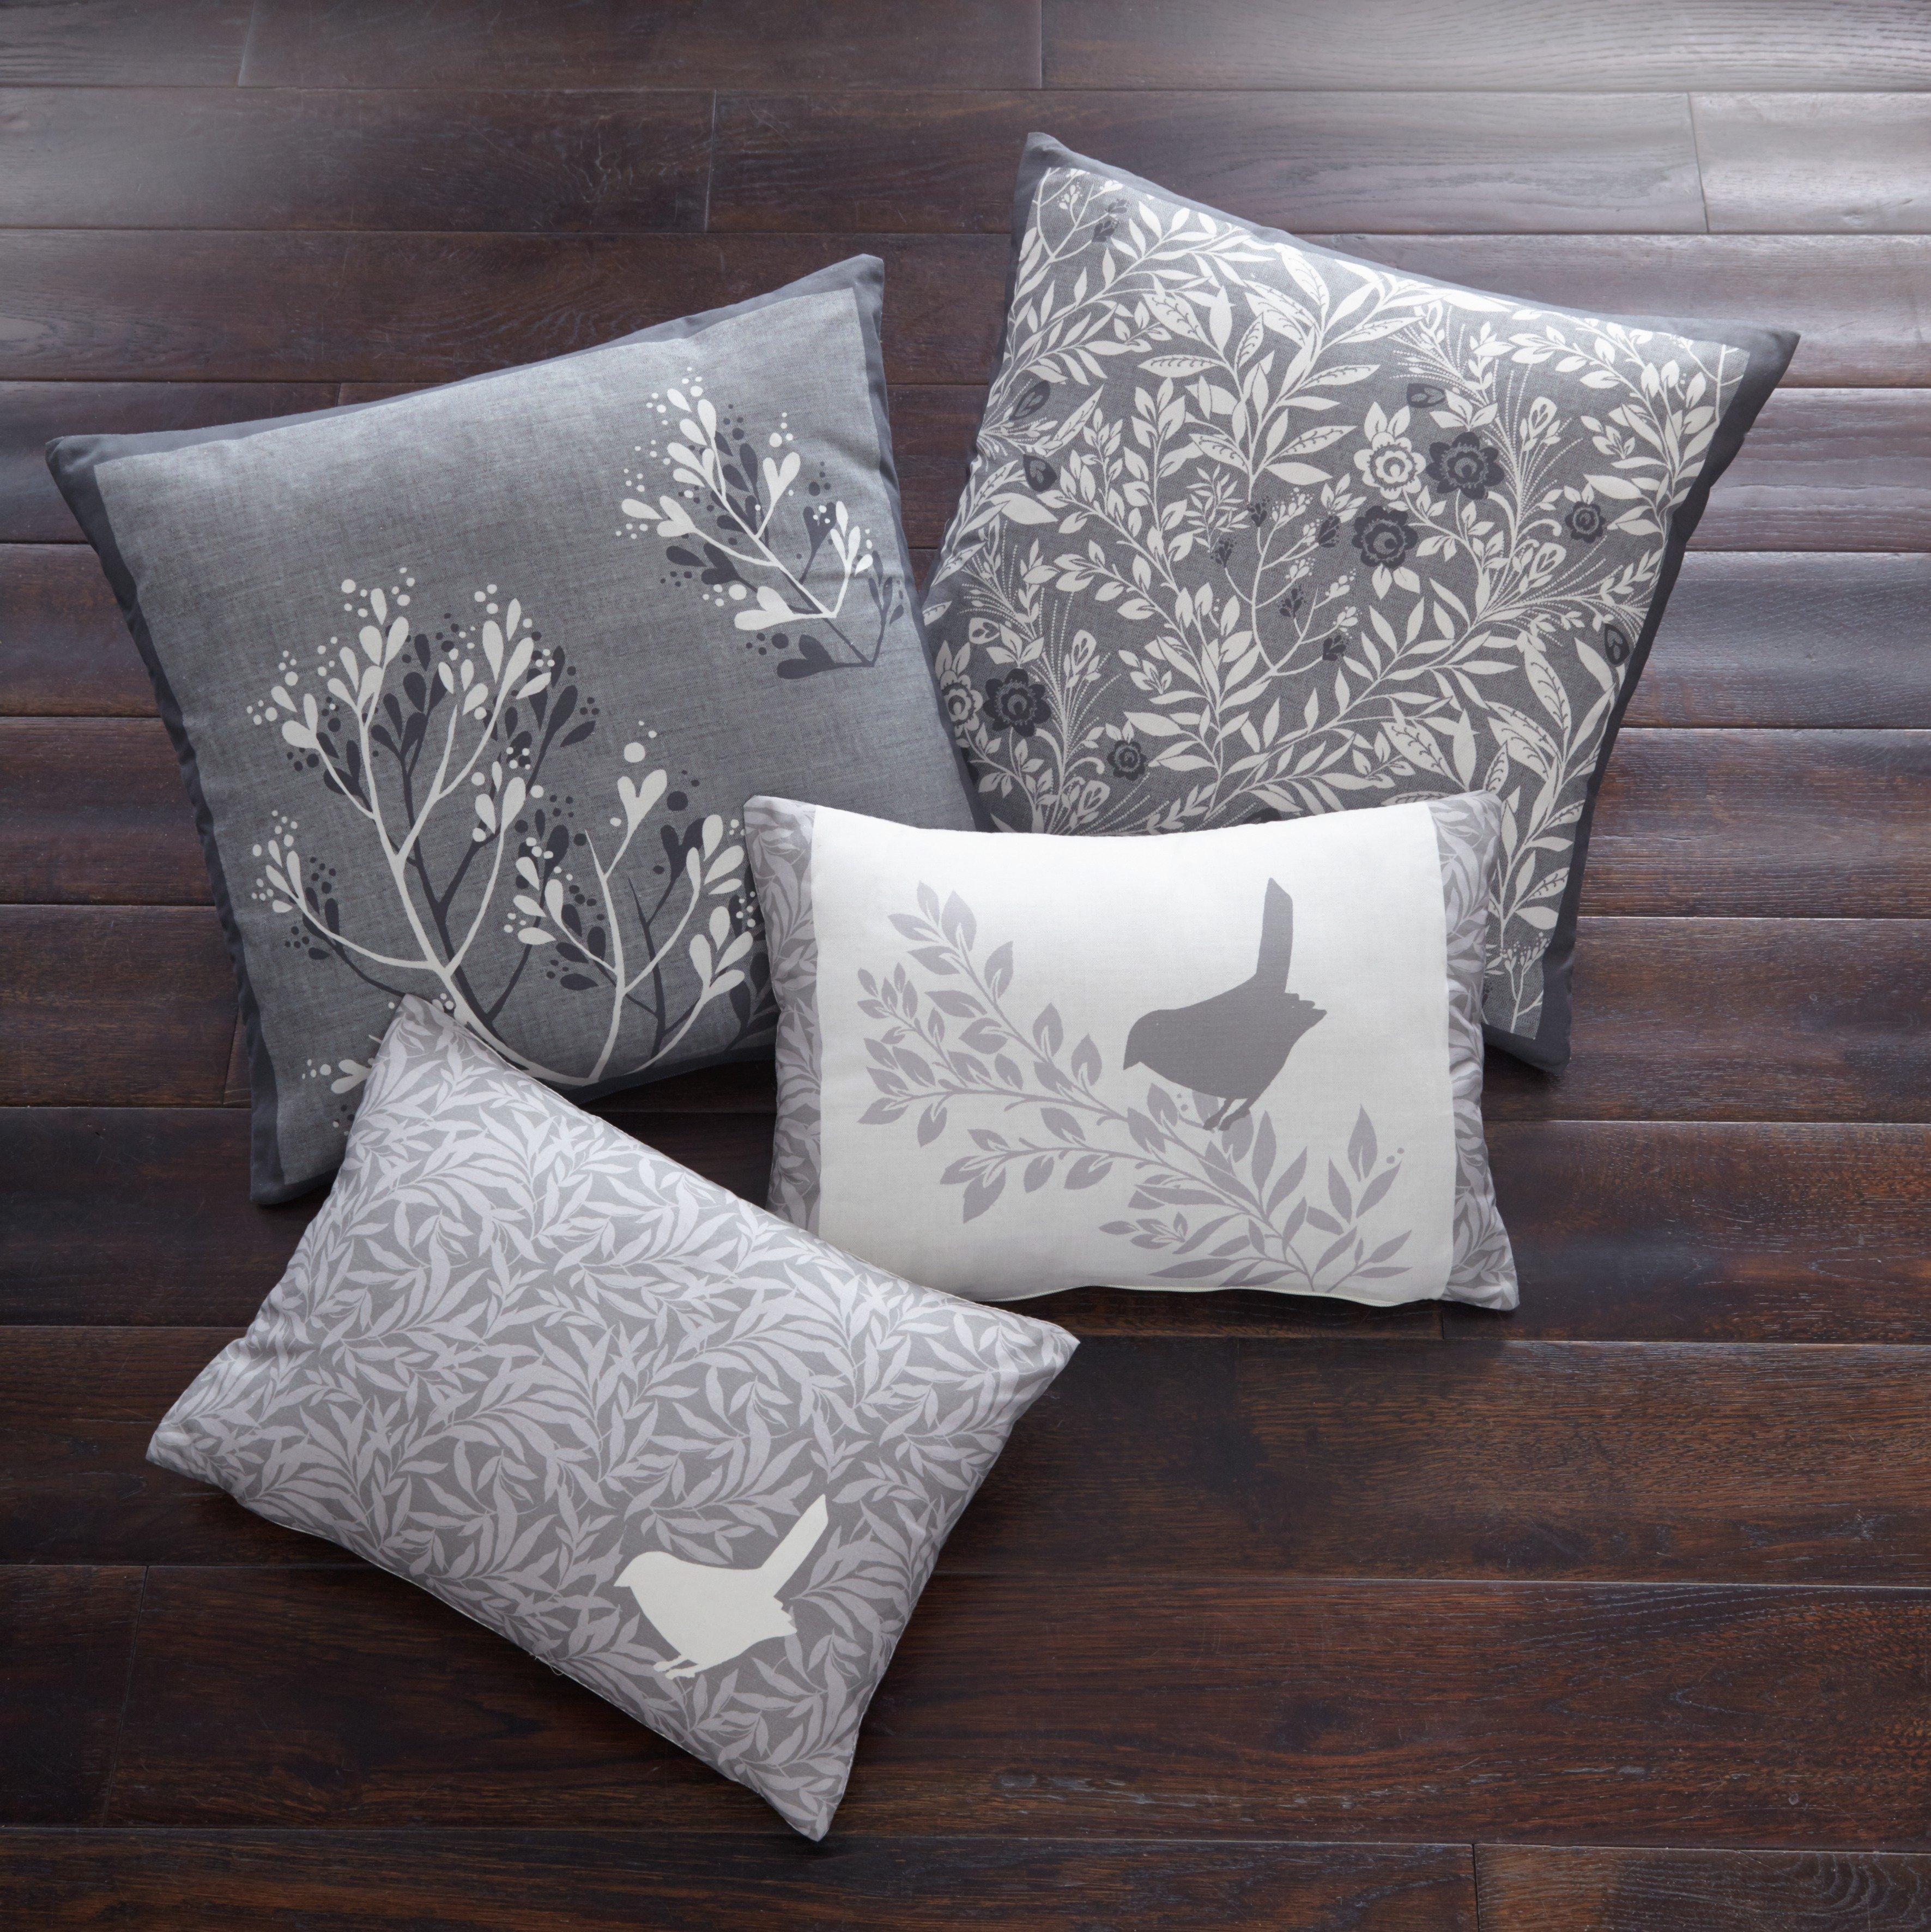 Image of Dreams N Drapes Hanworth Cushion 43x43cm - Charcoal.